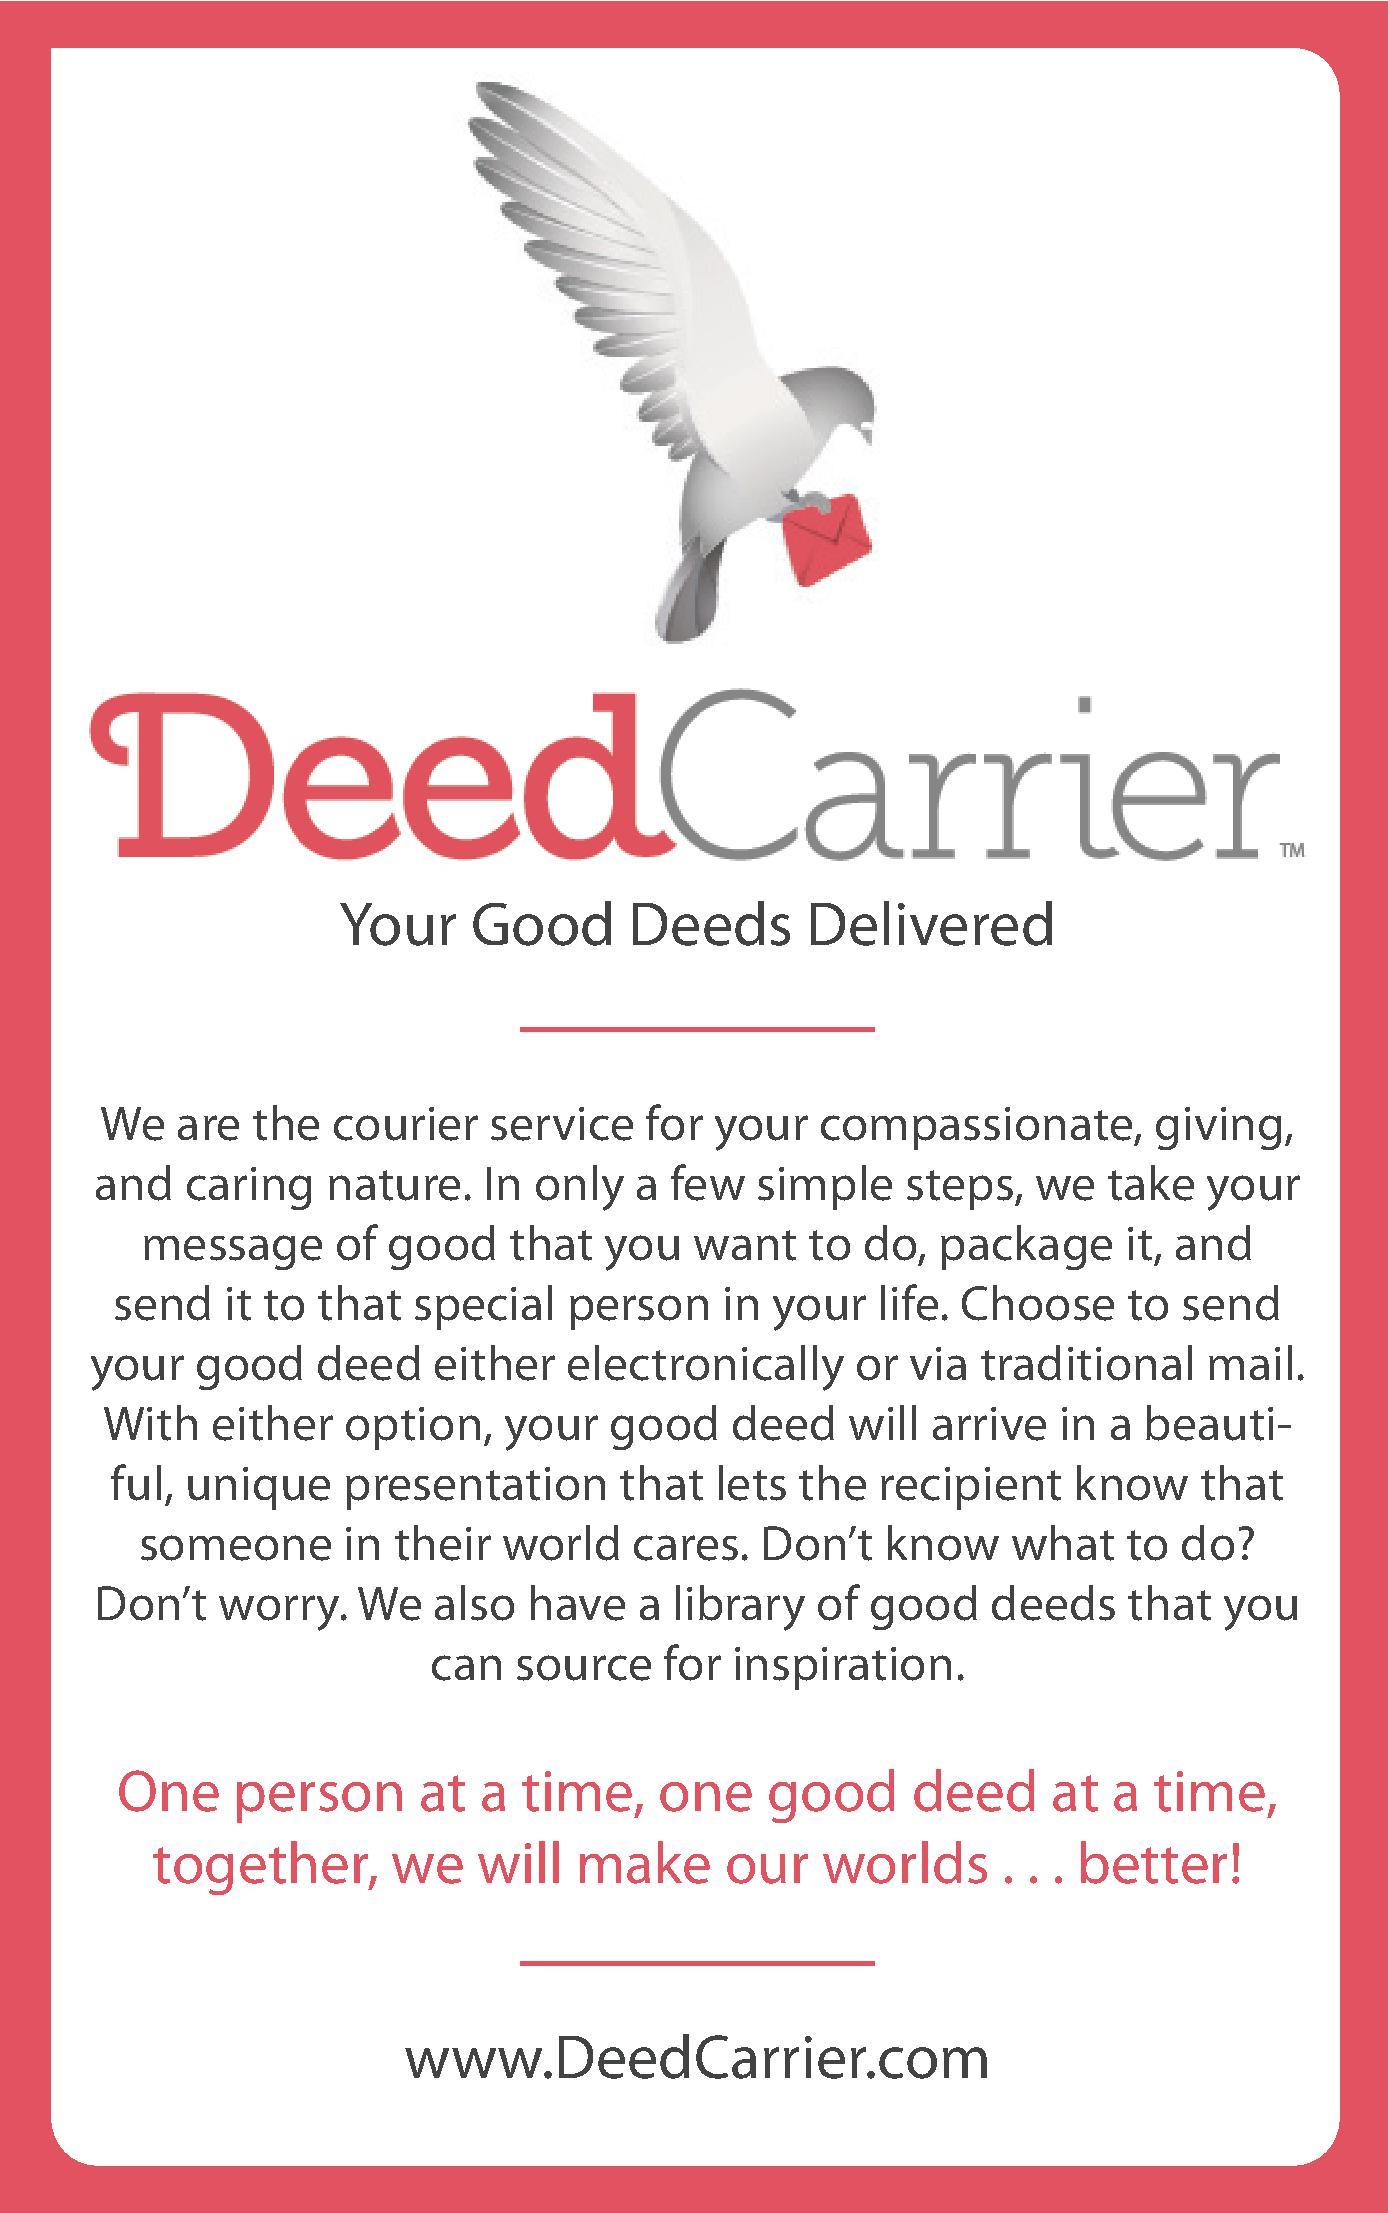 DeedCarrier